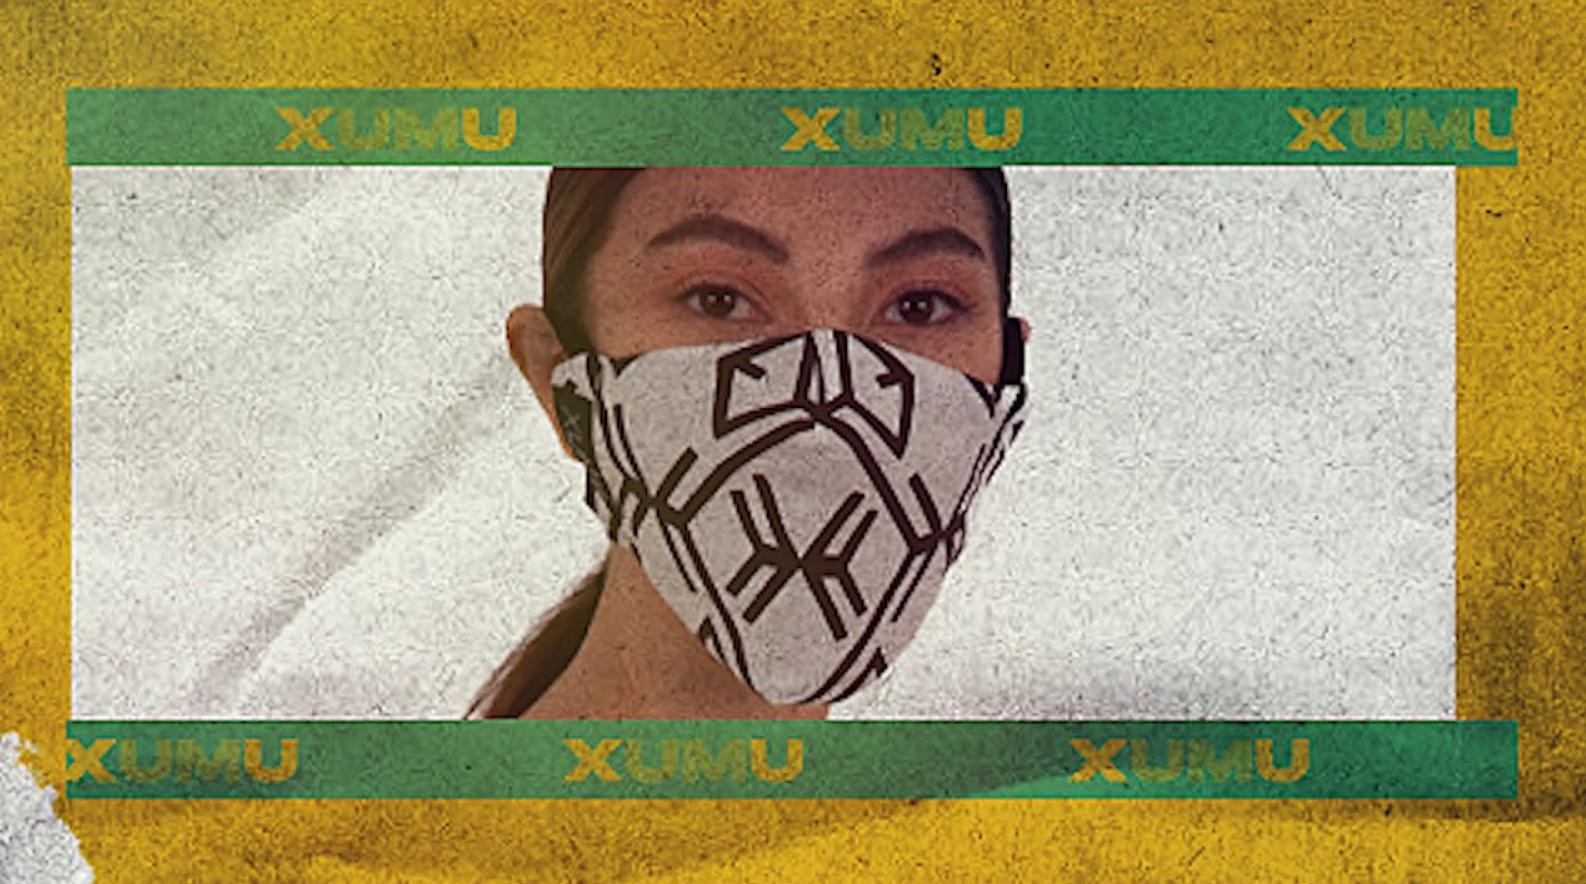 Xumu masks by batuhan dalci and melih bilgin